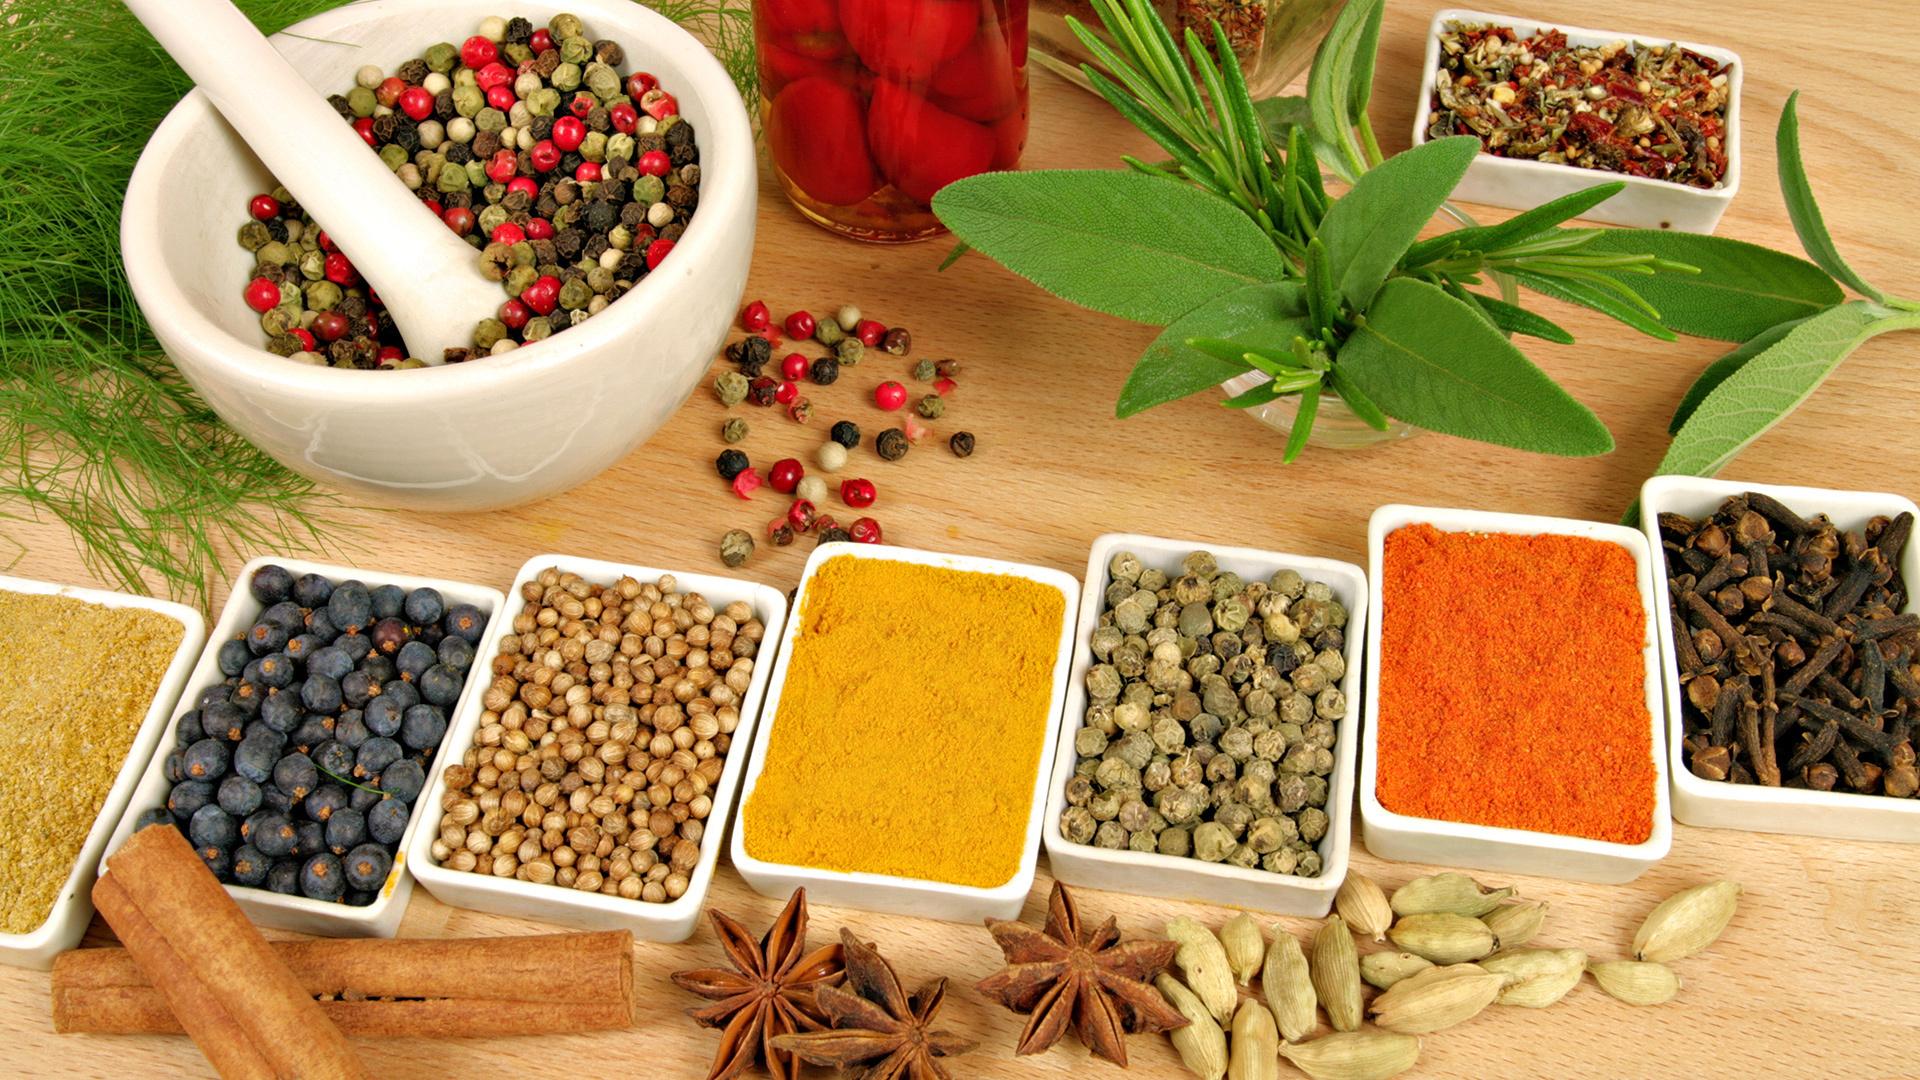 Nima fotovat shandiz natural foods 1